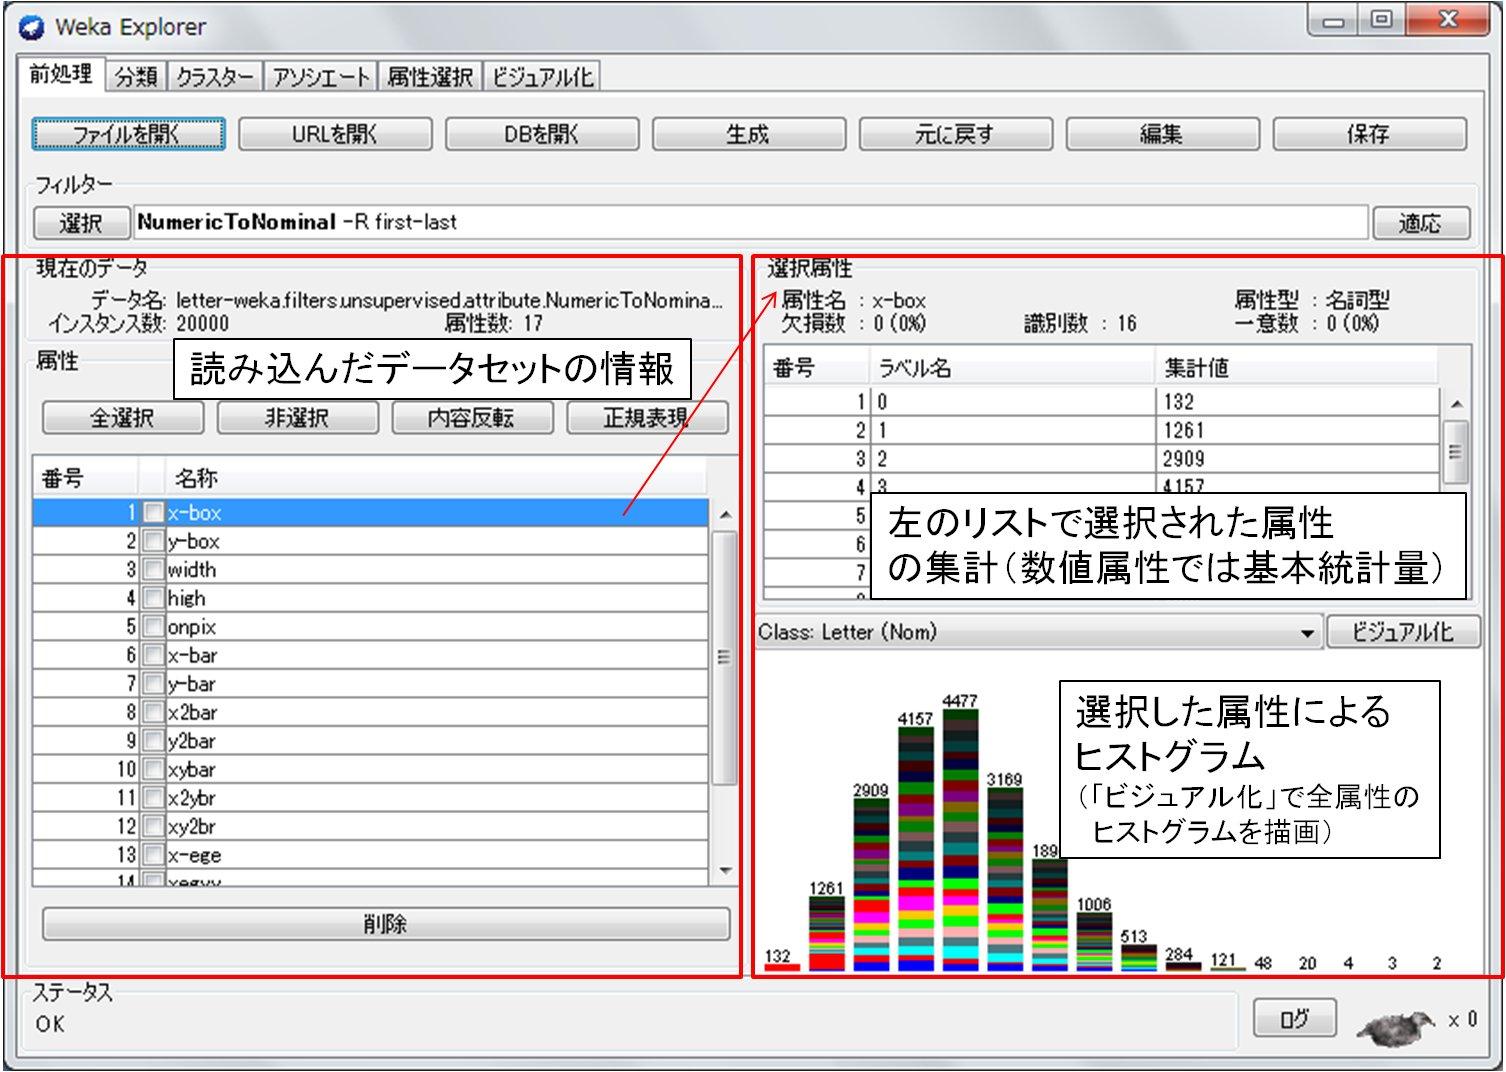 WekaのExplorer前処理(preprocess)パネルでの視覚化